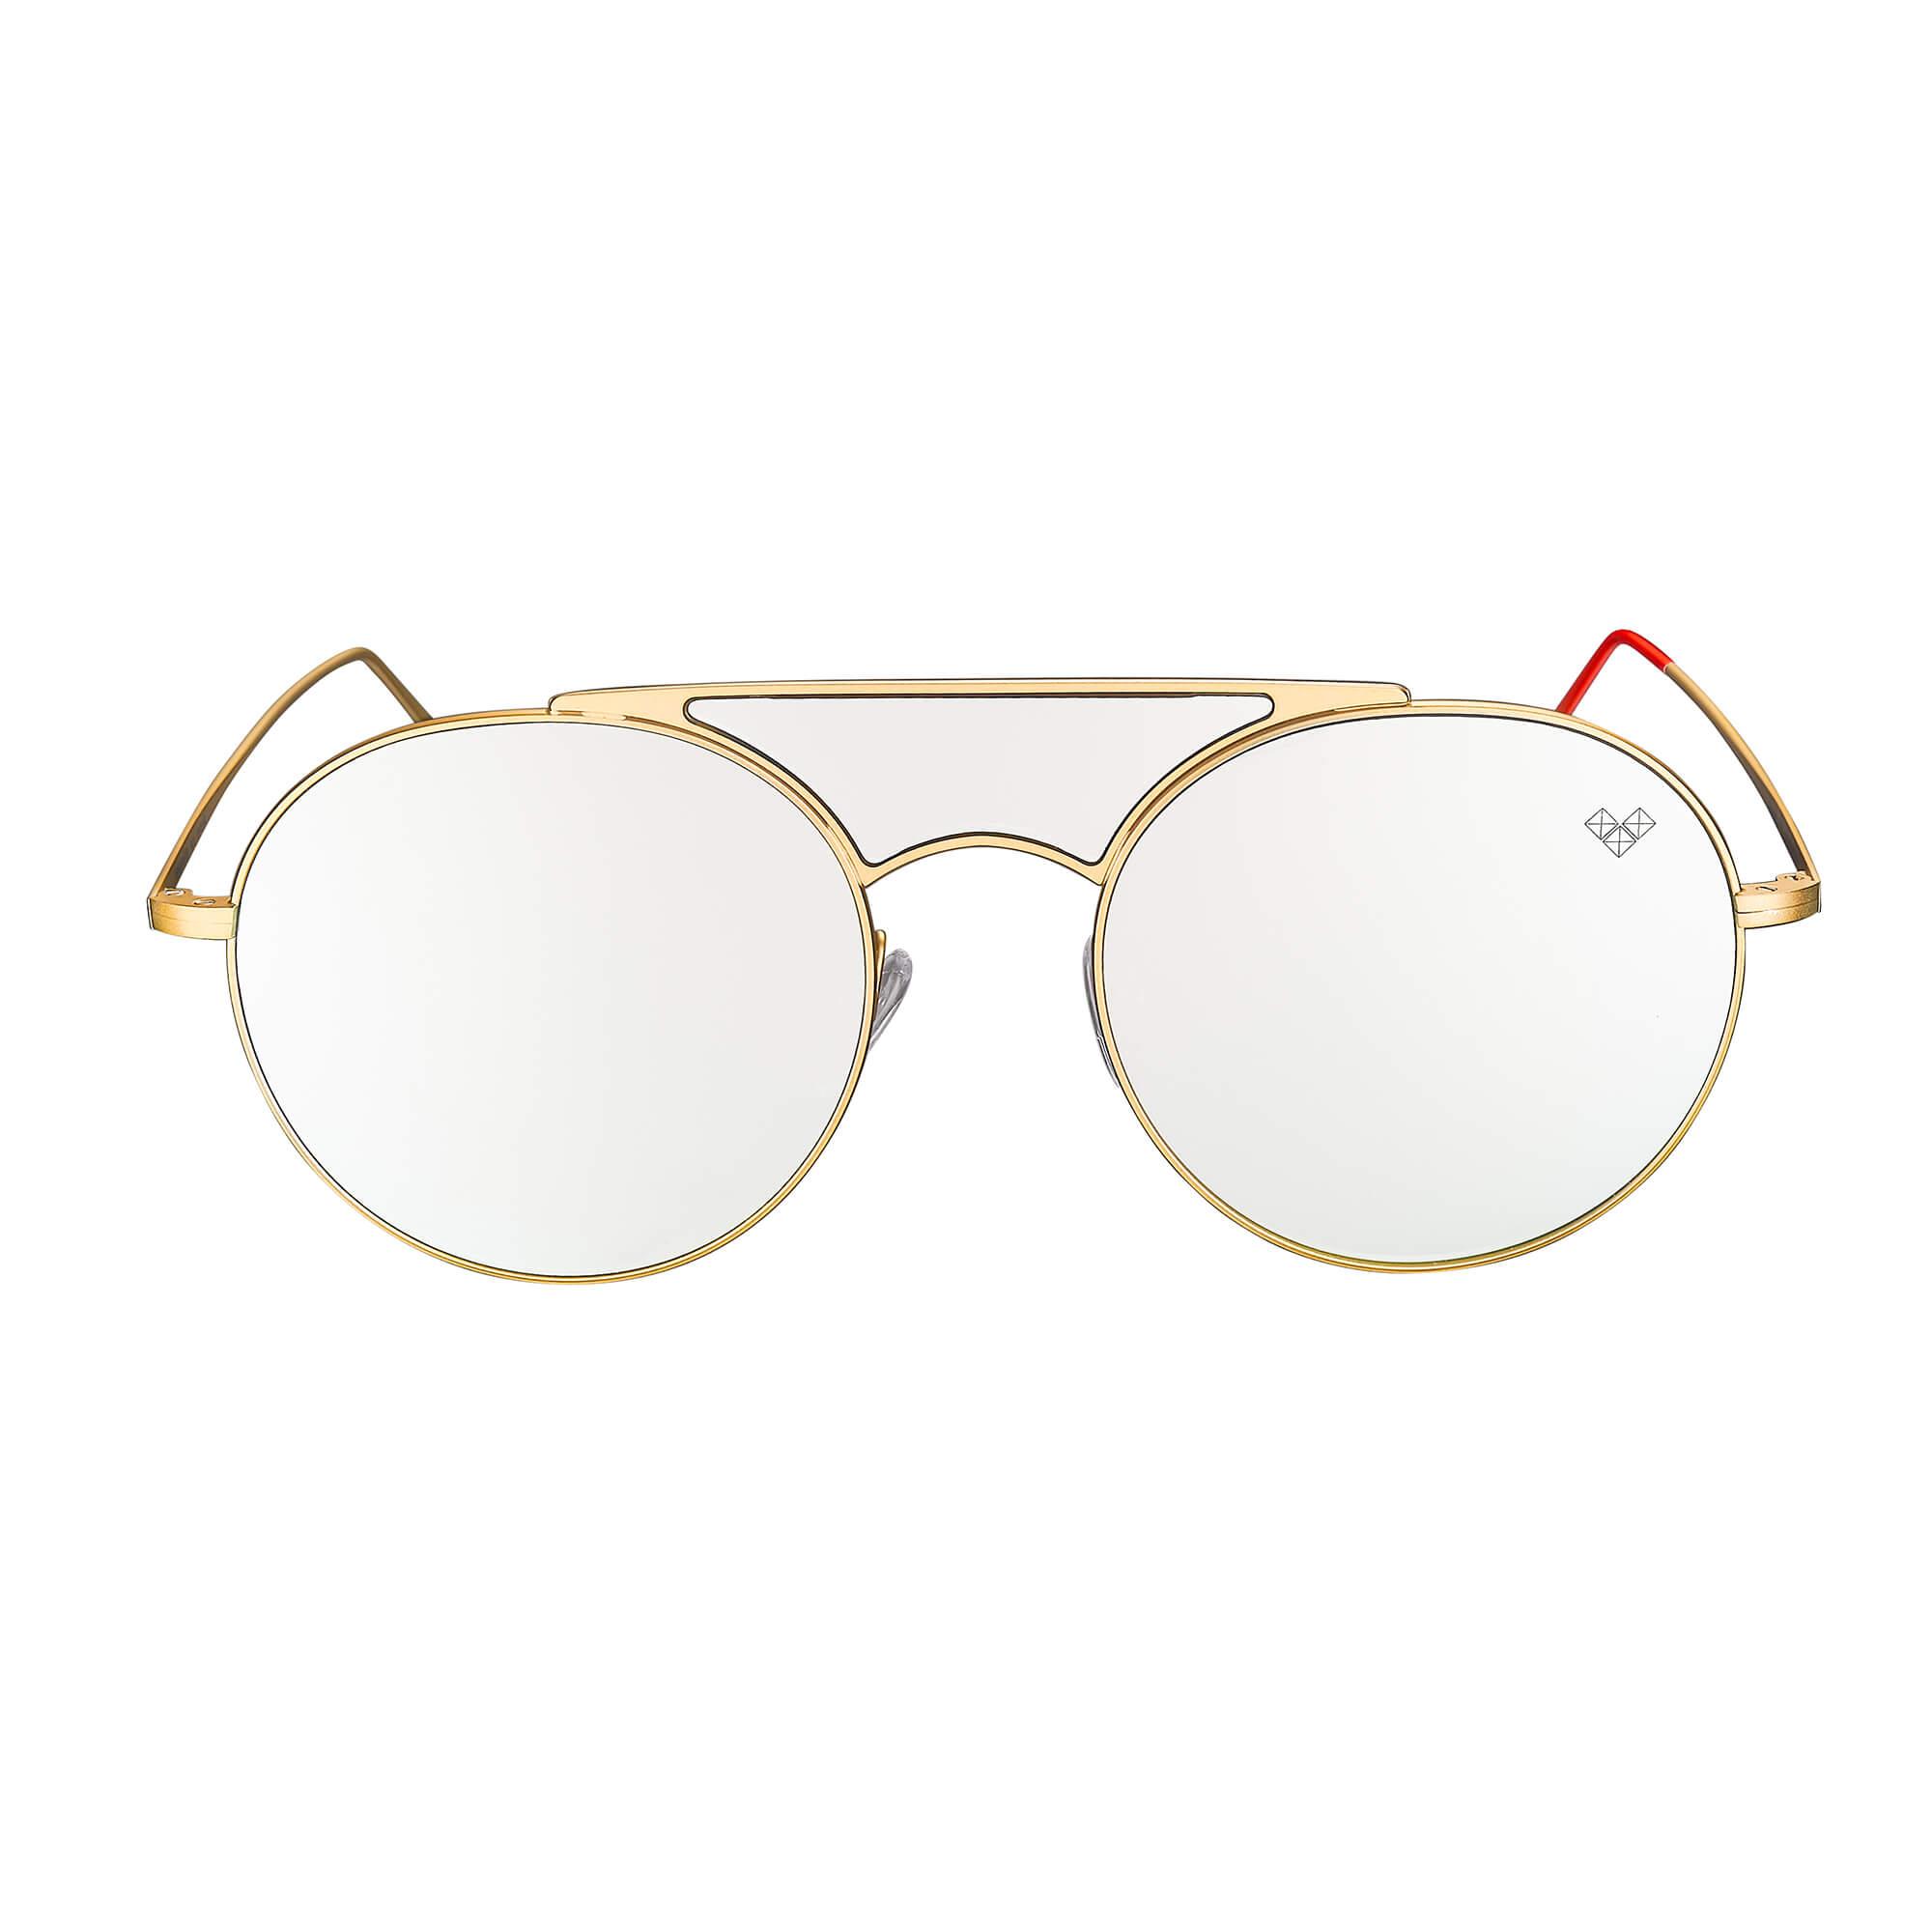 Kalai - Ariadna Gutierrez - KL - 3 + Matte Gold Frame + Silver Mirror Lenses